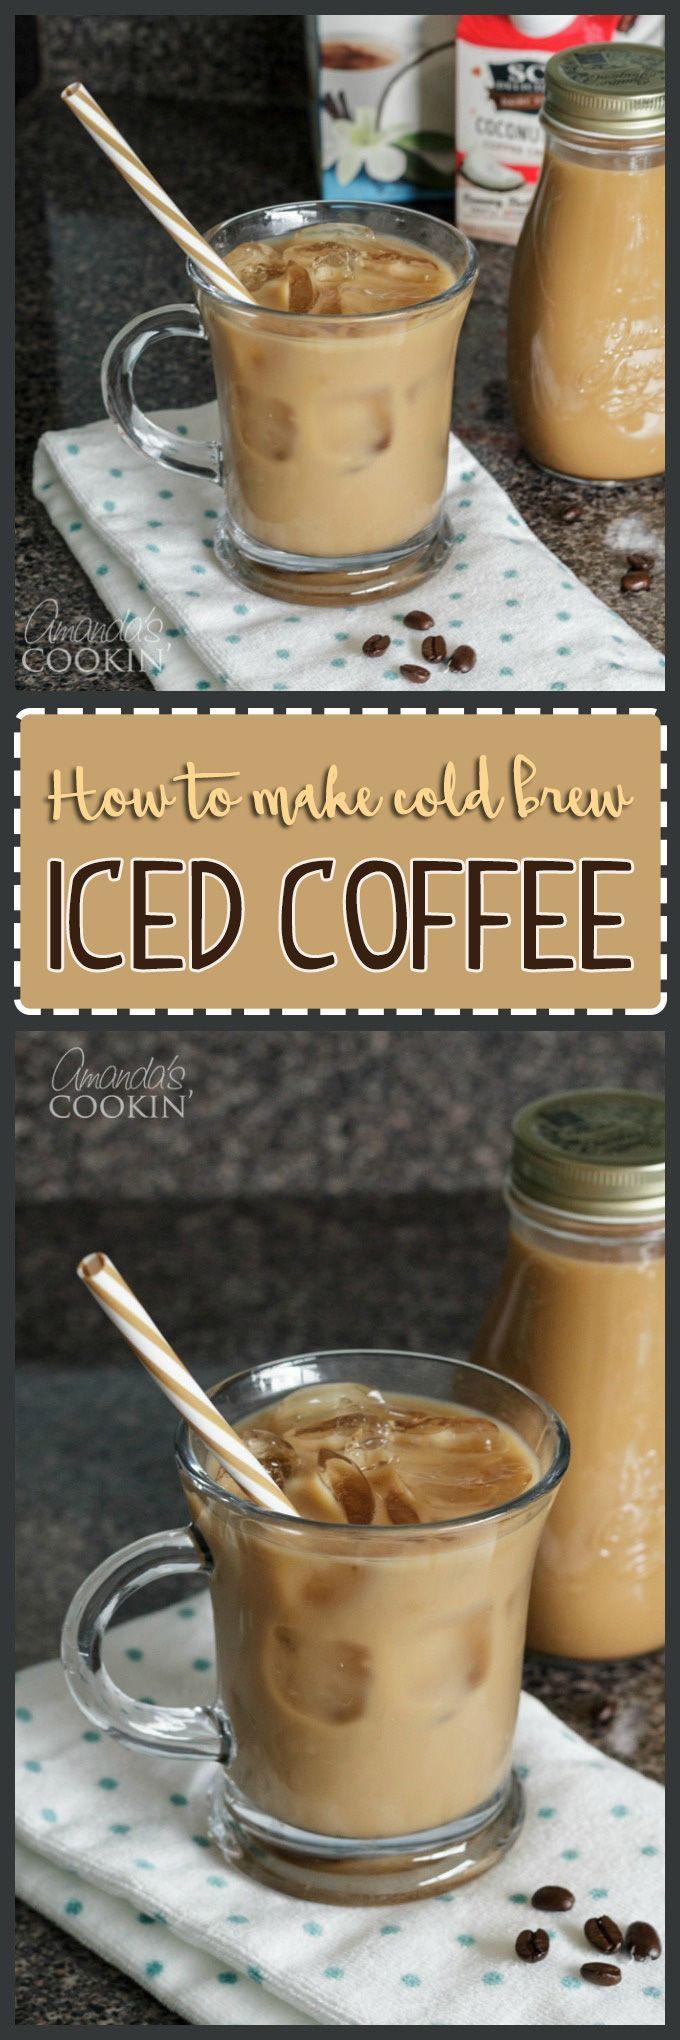 I love iced coffee, especially vanilla iced coffee! Making